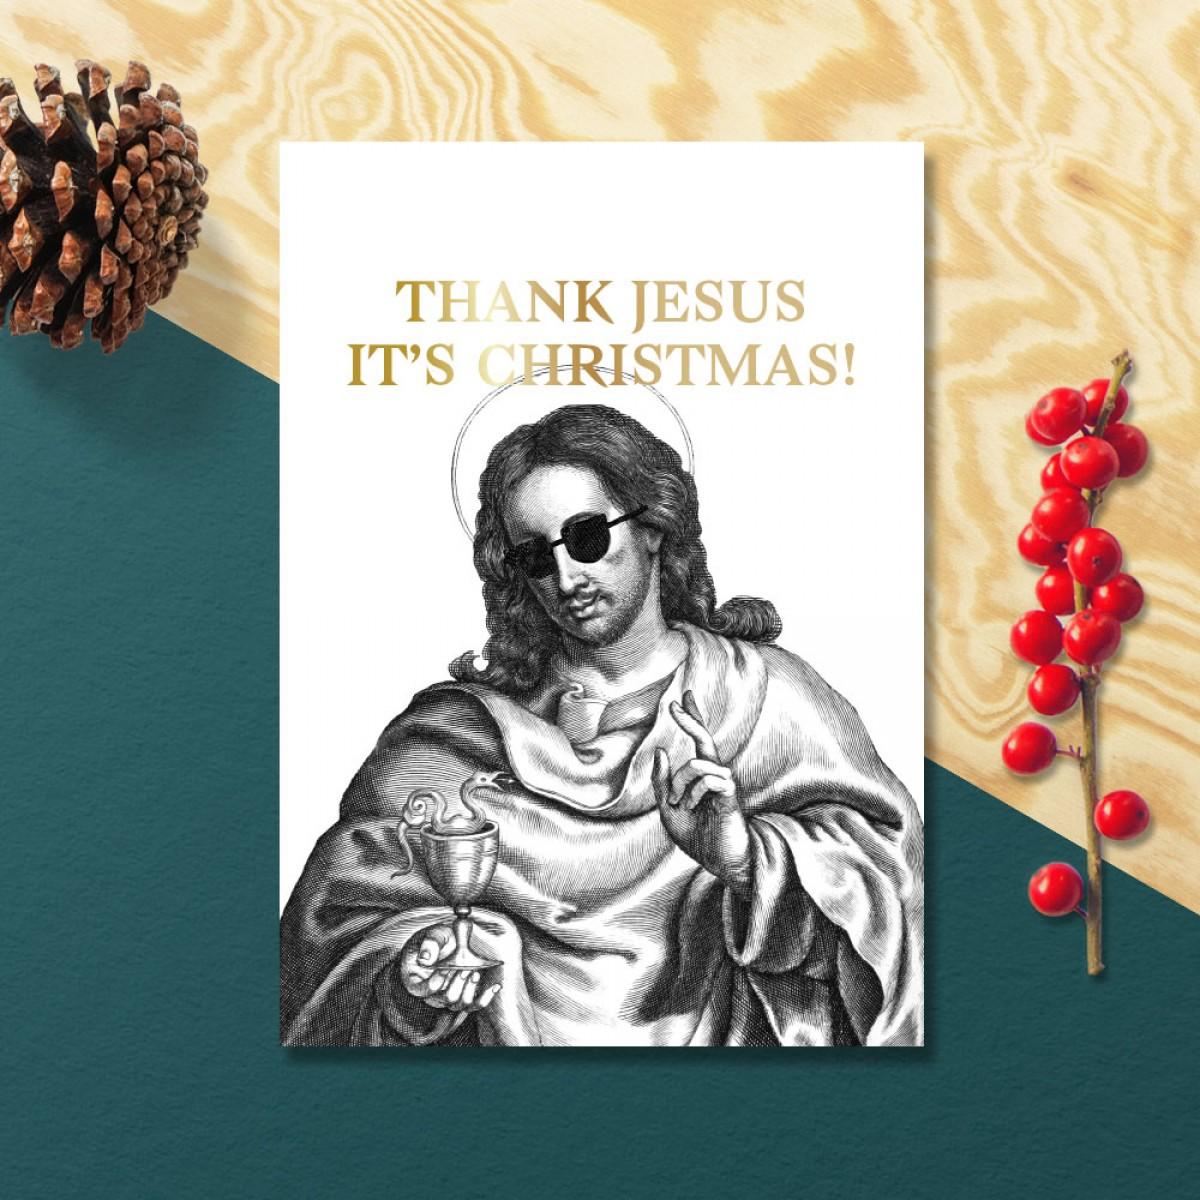 3er-Set – THANK JESUS IT'S CHRISTMAS! –  Chiara Tempel – Weihnachtskarten, goldene Heißfolienprägung